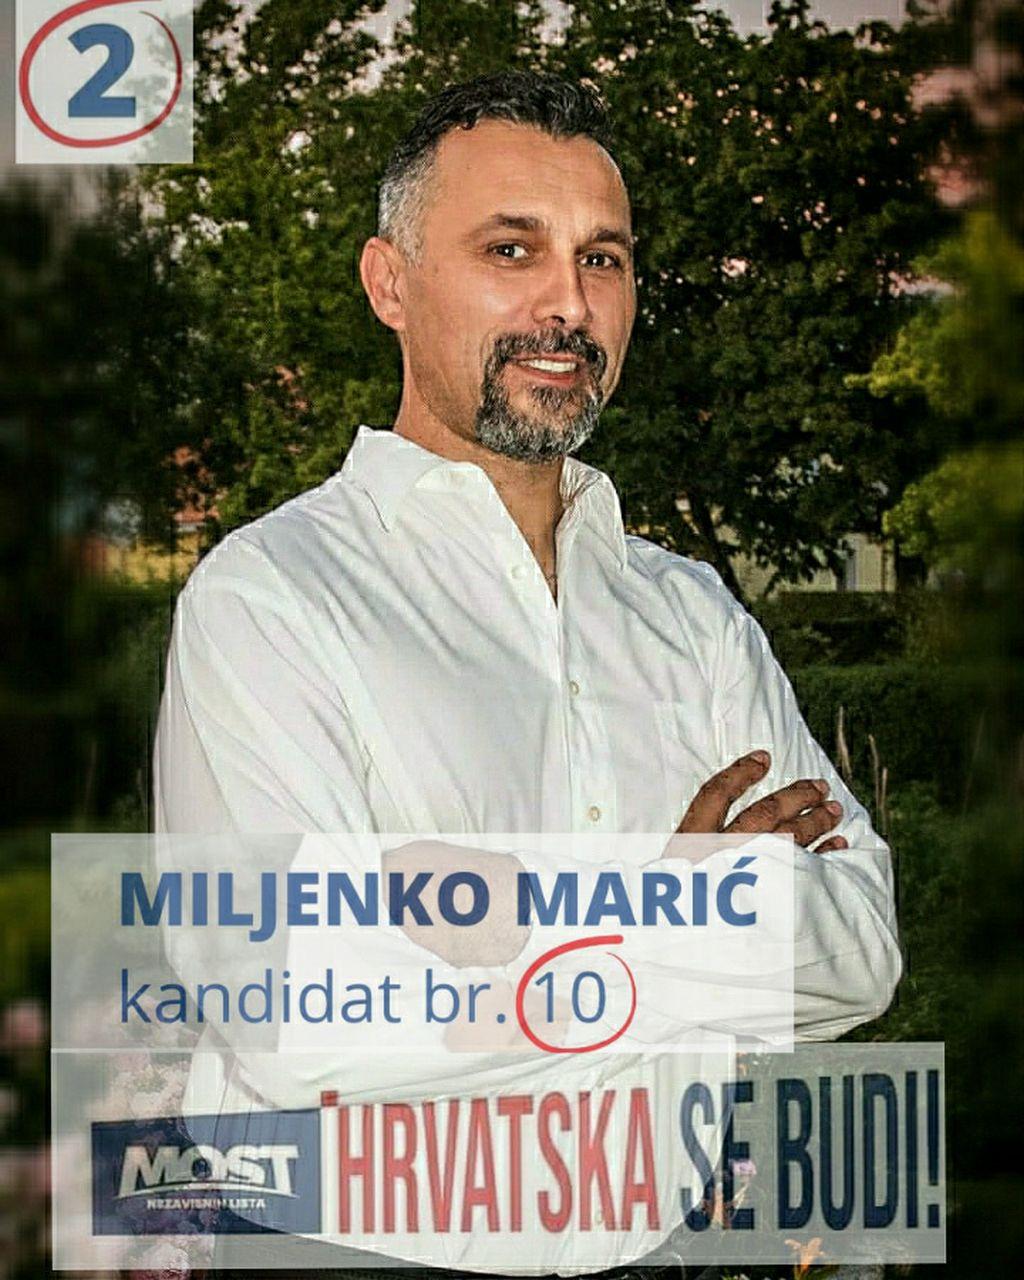 Miljenko Marić